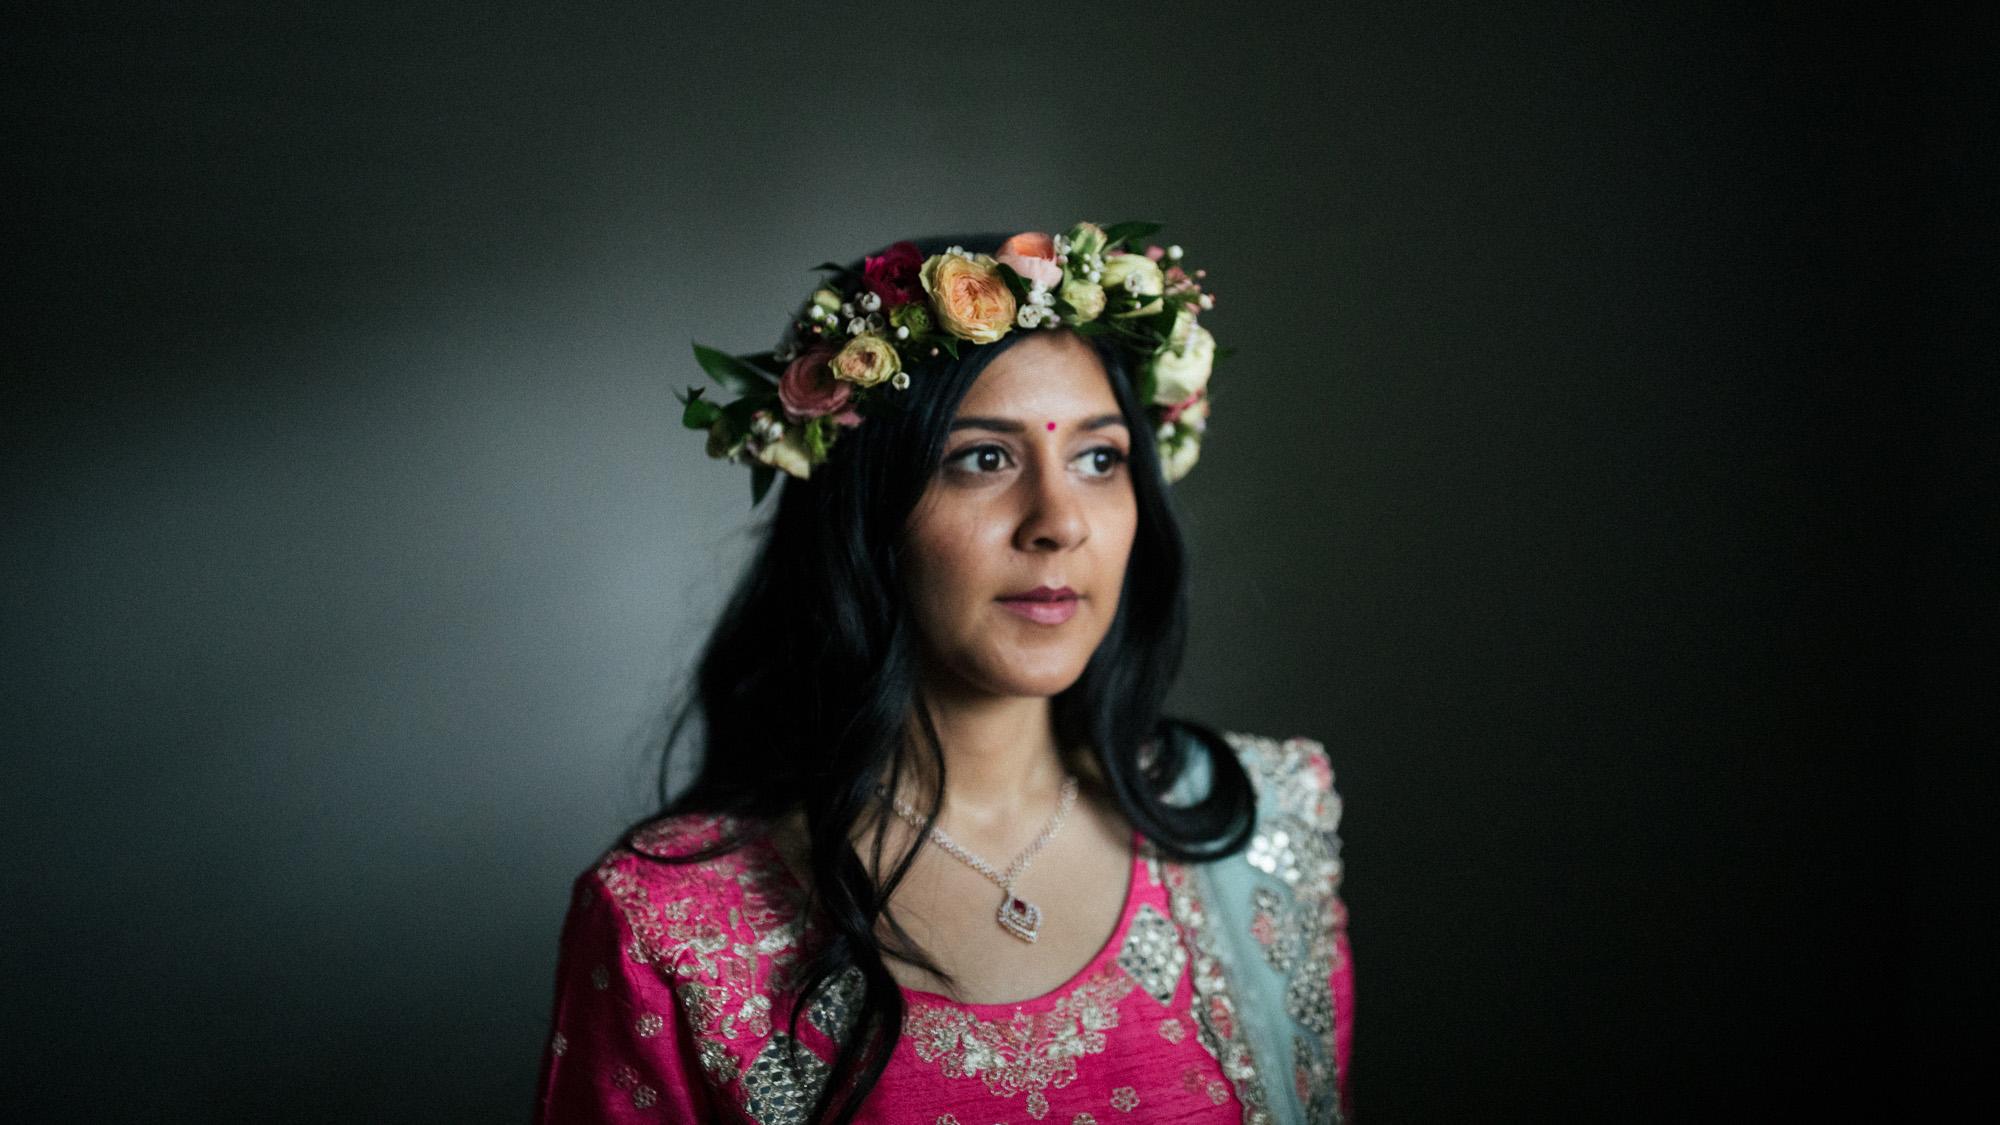 anu_maneesh_alec_vanderboom_Indian_wedding_photography-0019.jpg